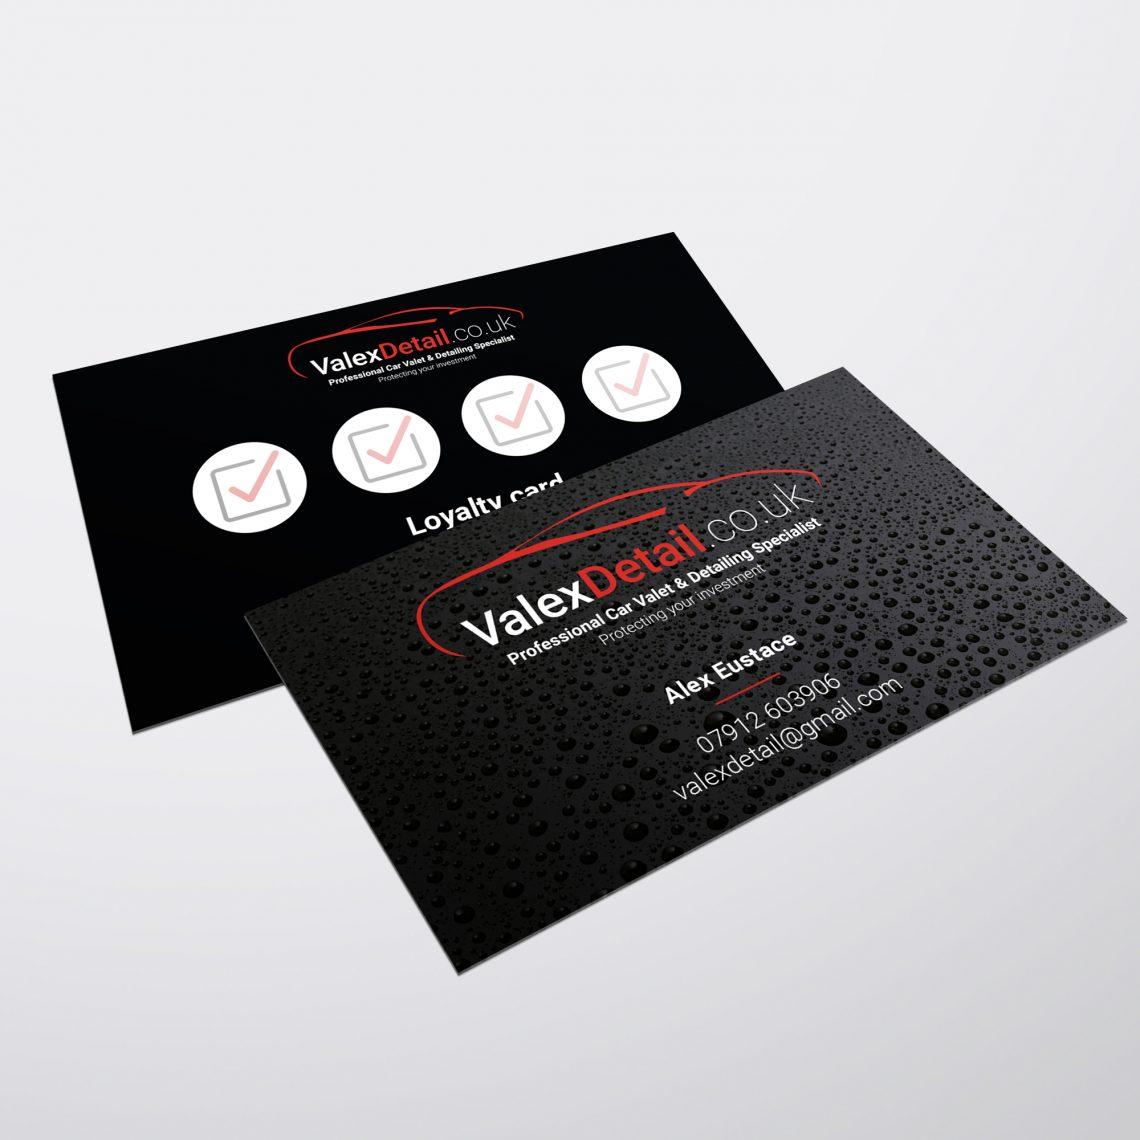 Valex Business Card Design